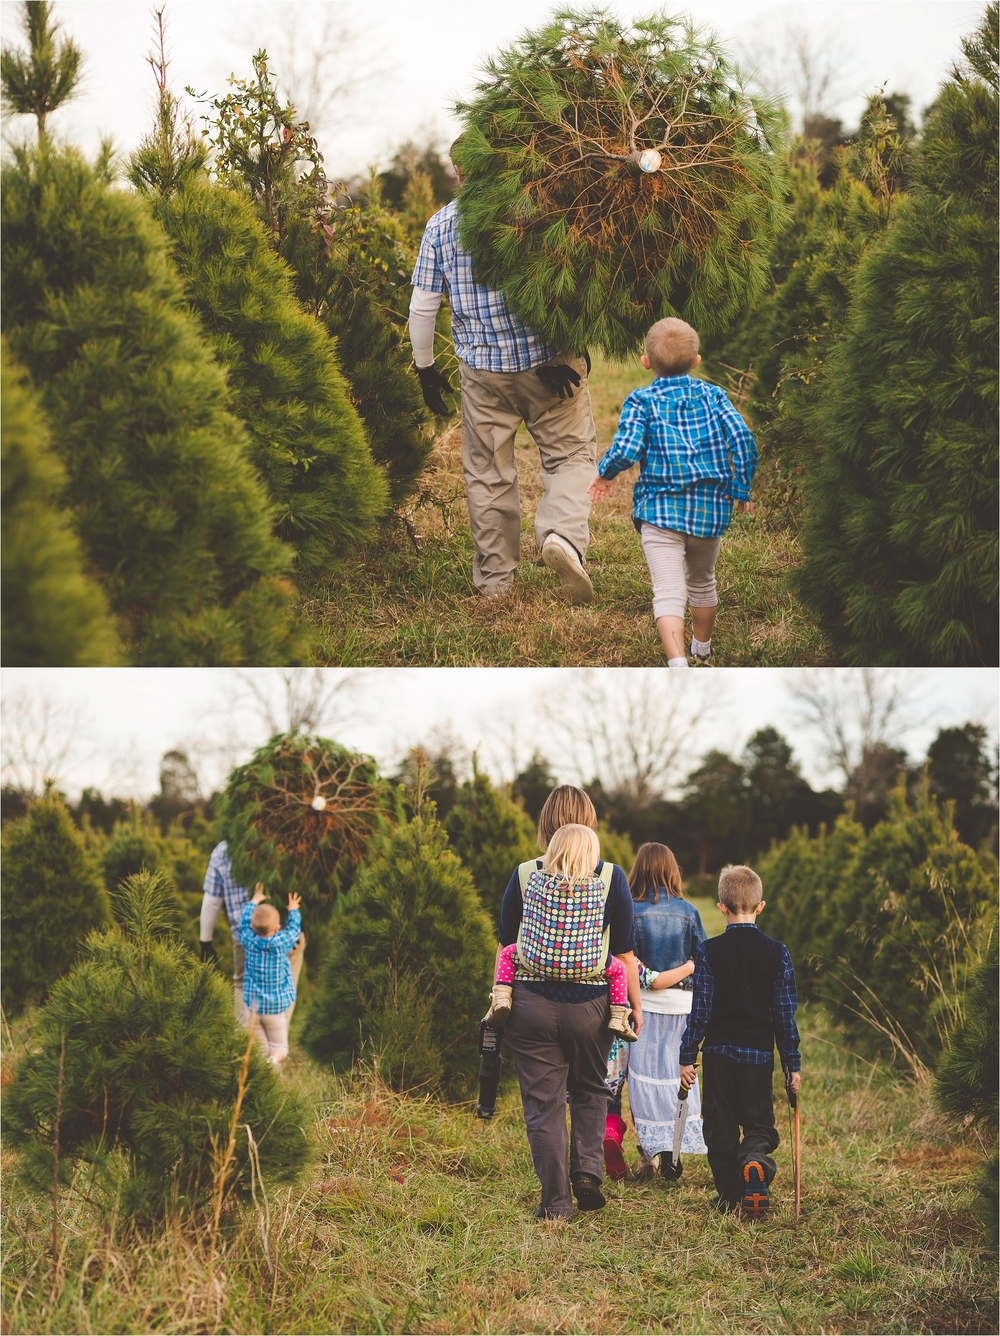 christmas-tree-farm-session-pnw-jannicka-mayte_0042.jpg